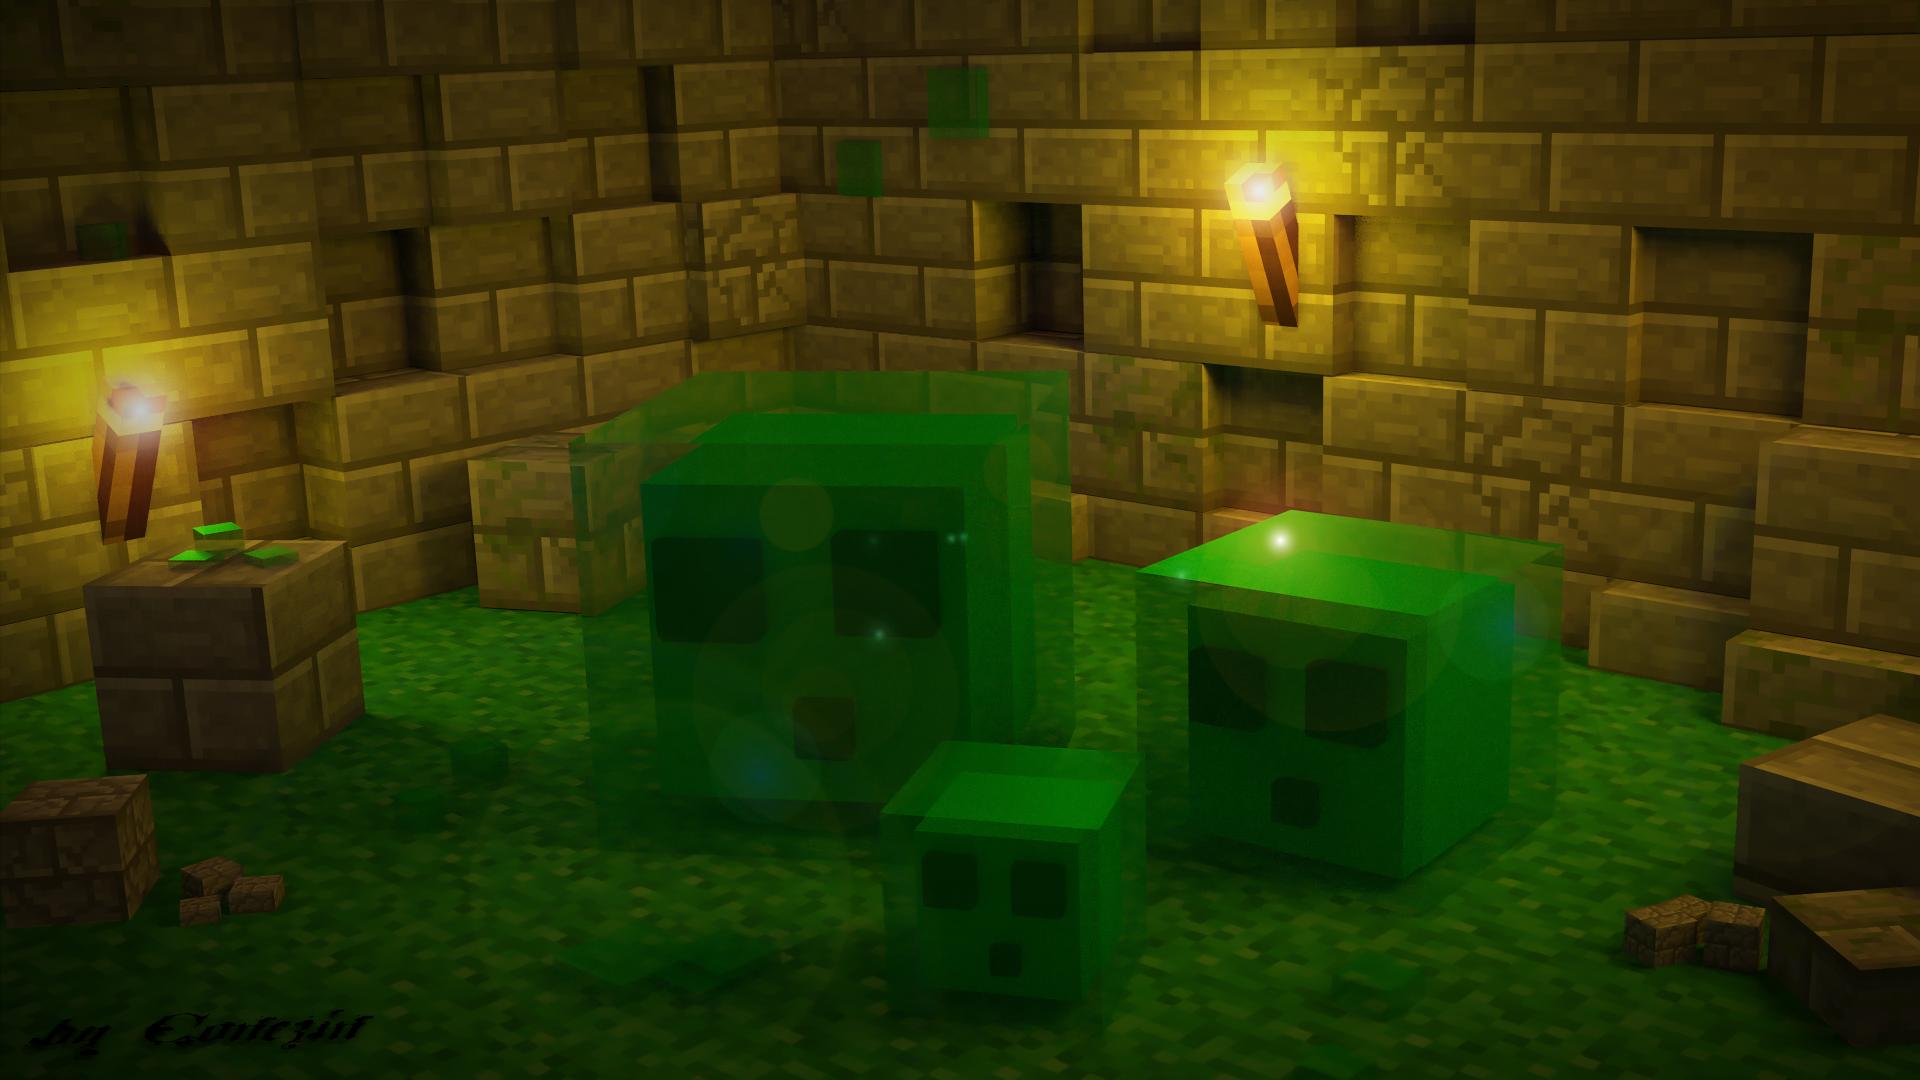 Minecraft Fondo De Pantalla Hd: Minecraft Slime Fondo De Pantalla HD